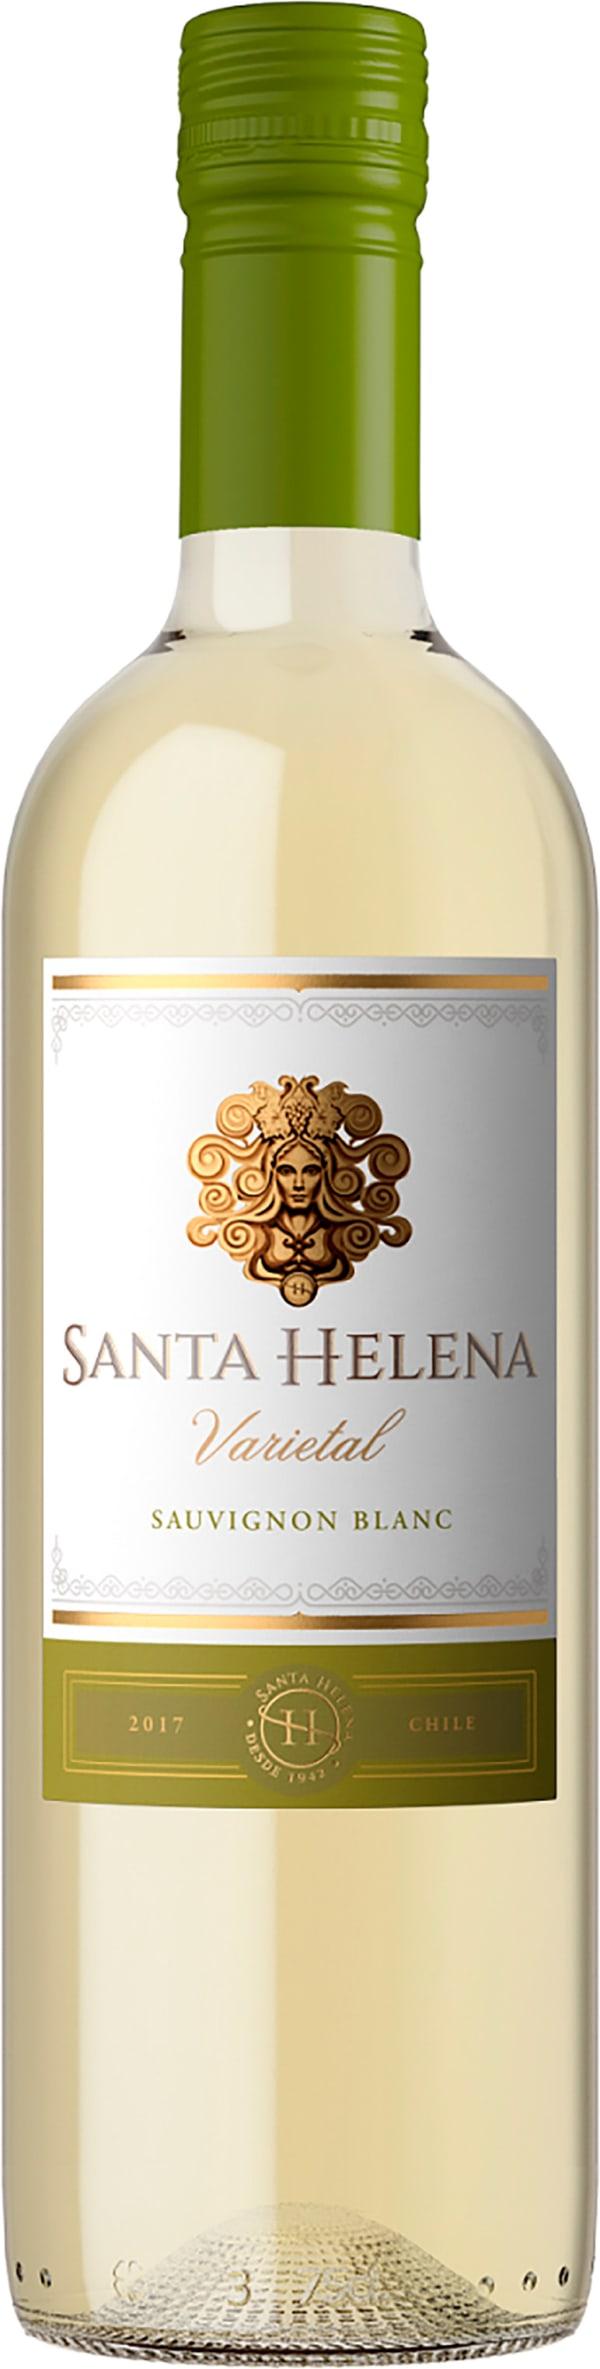 Santa Helena Varietal Sauvignon Blanc 2020